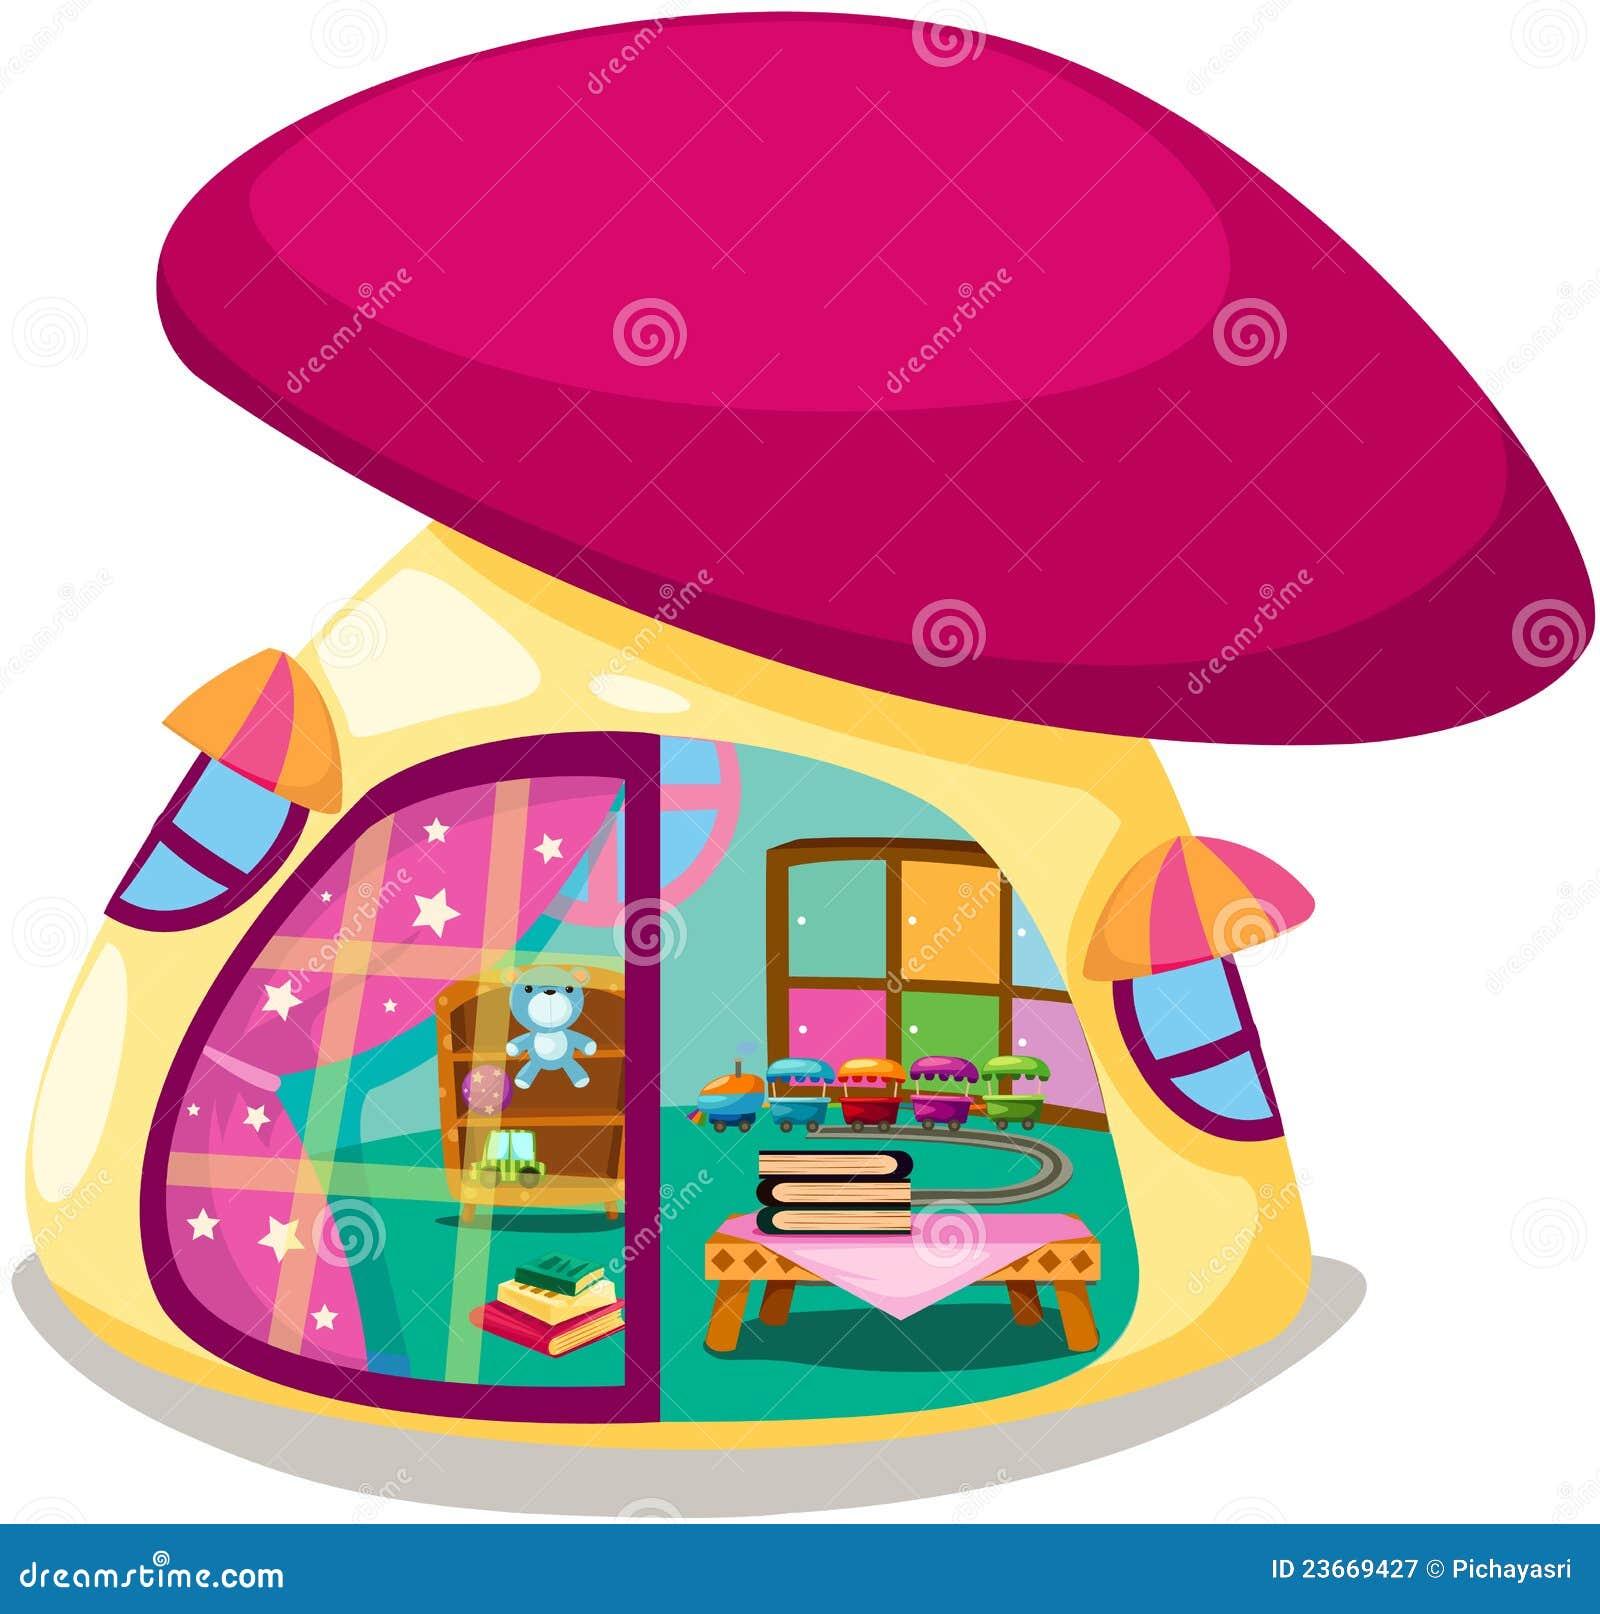 Download Mushroom playhouse stock vector. Illustration of building - 23669427